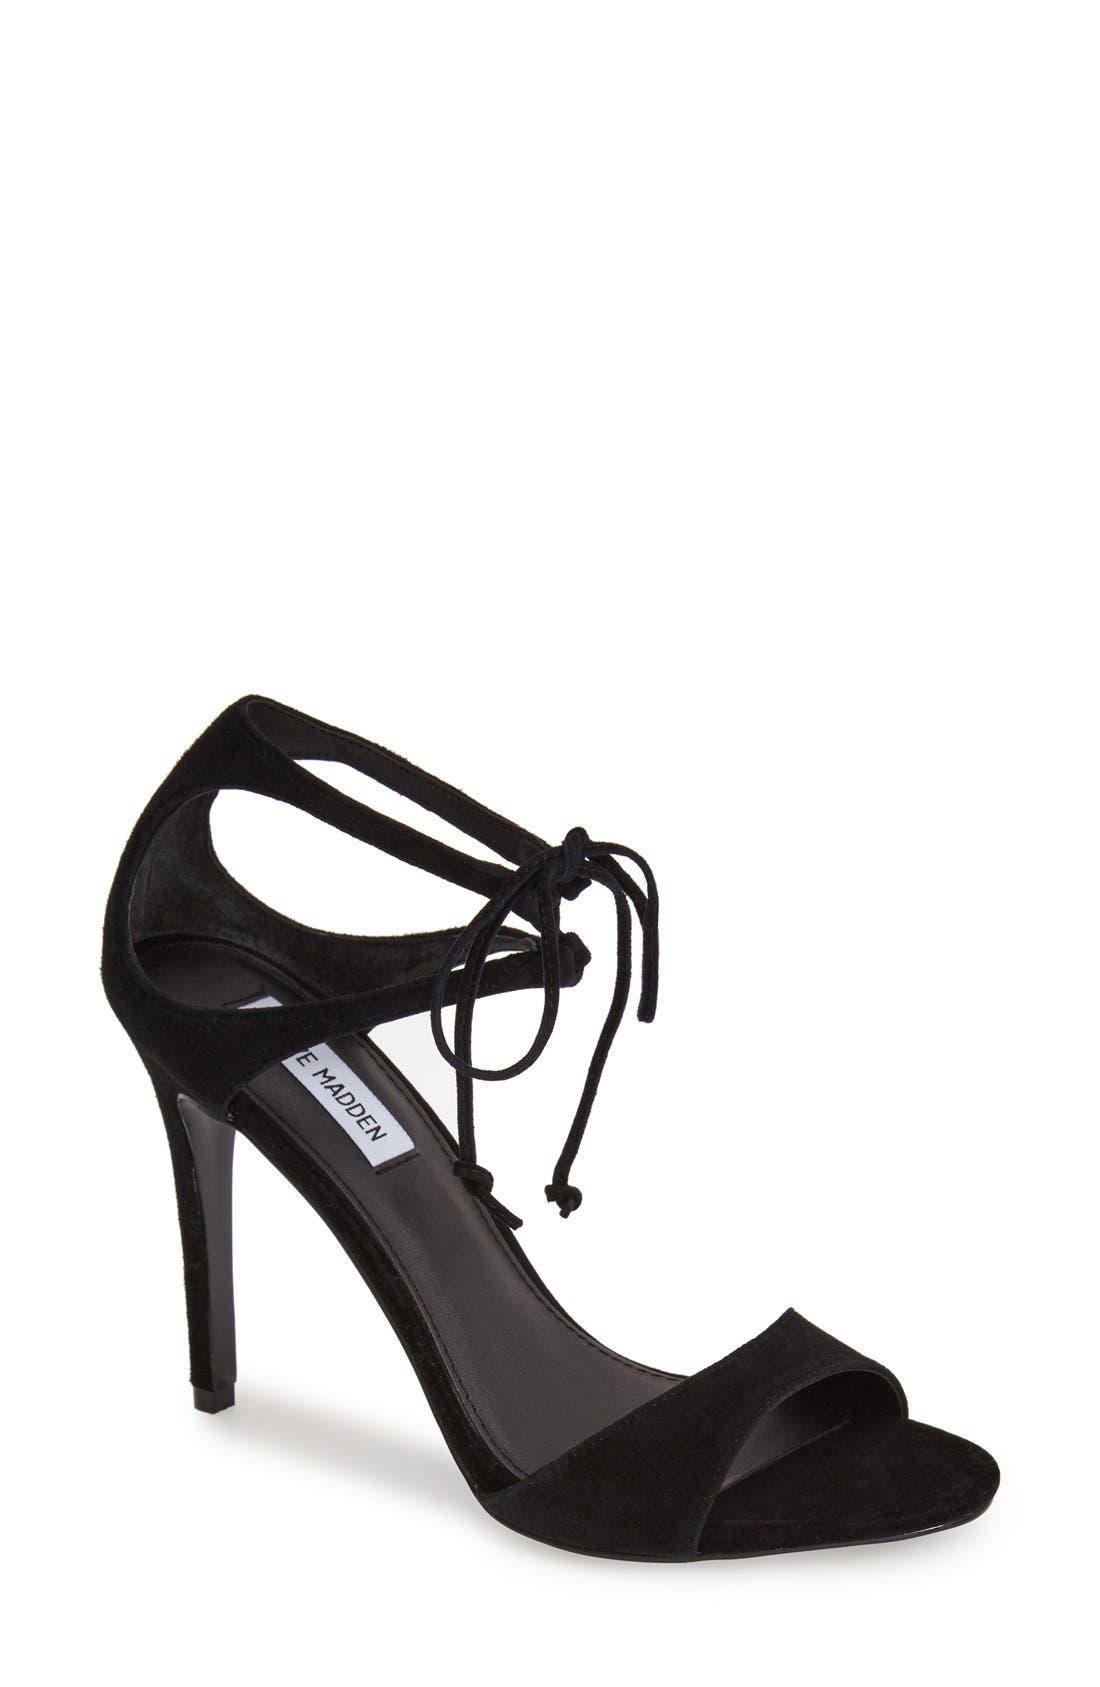 'Semona' Suede Ankle Strap Sandal,                             Main thumbnail 1, color,                             001